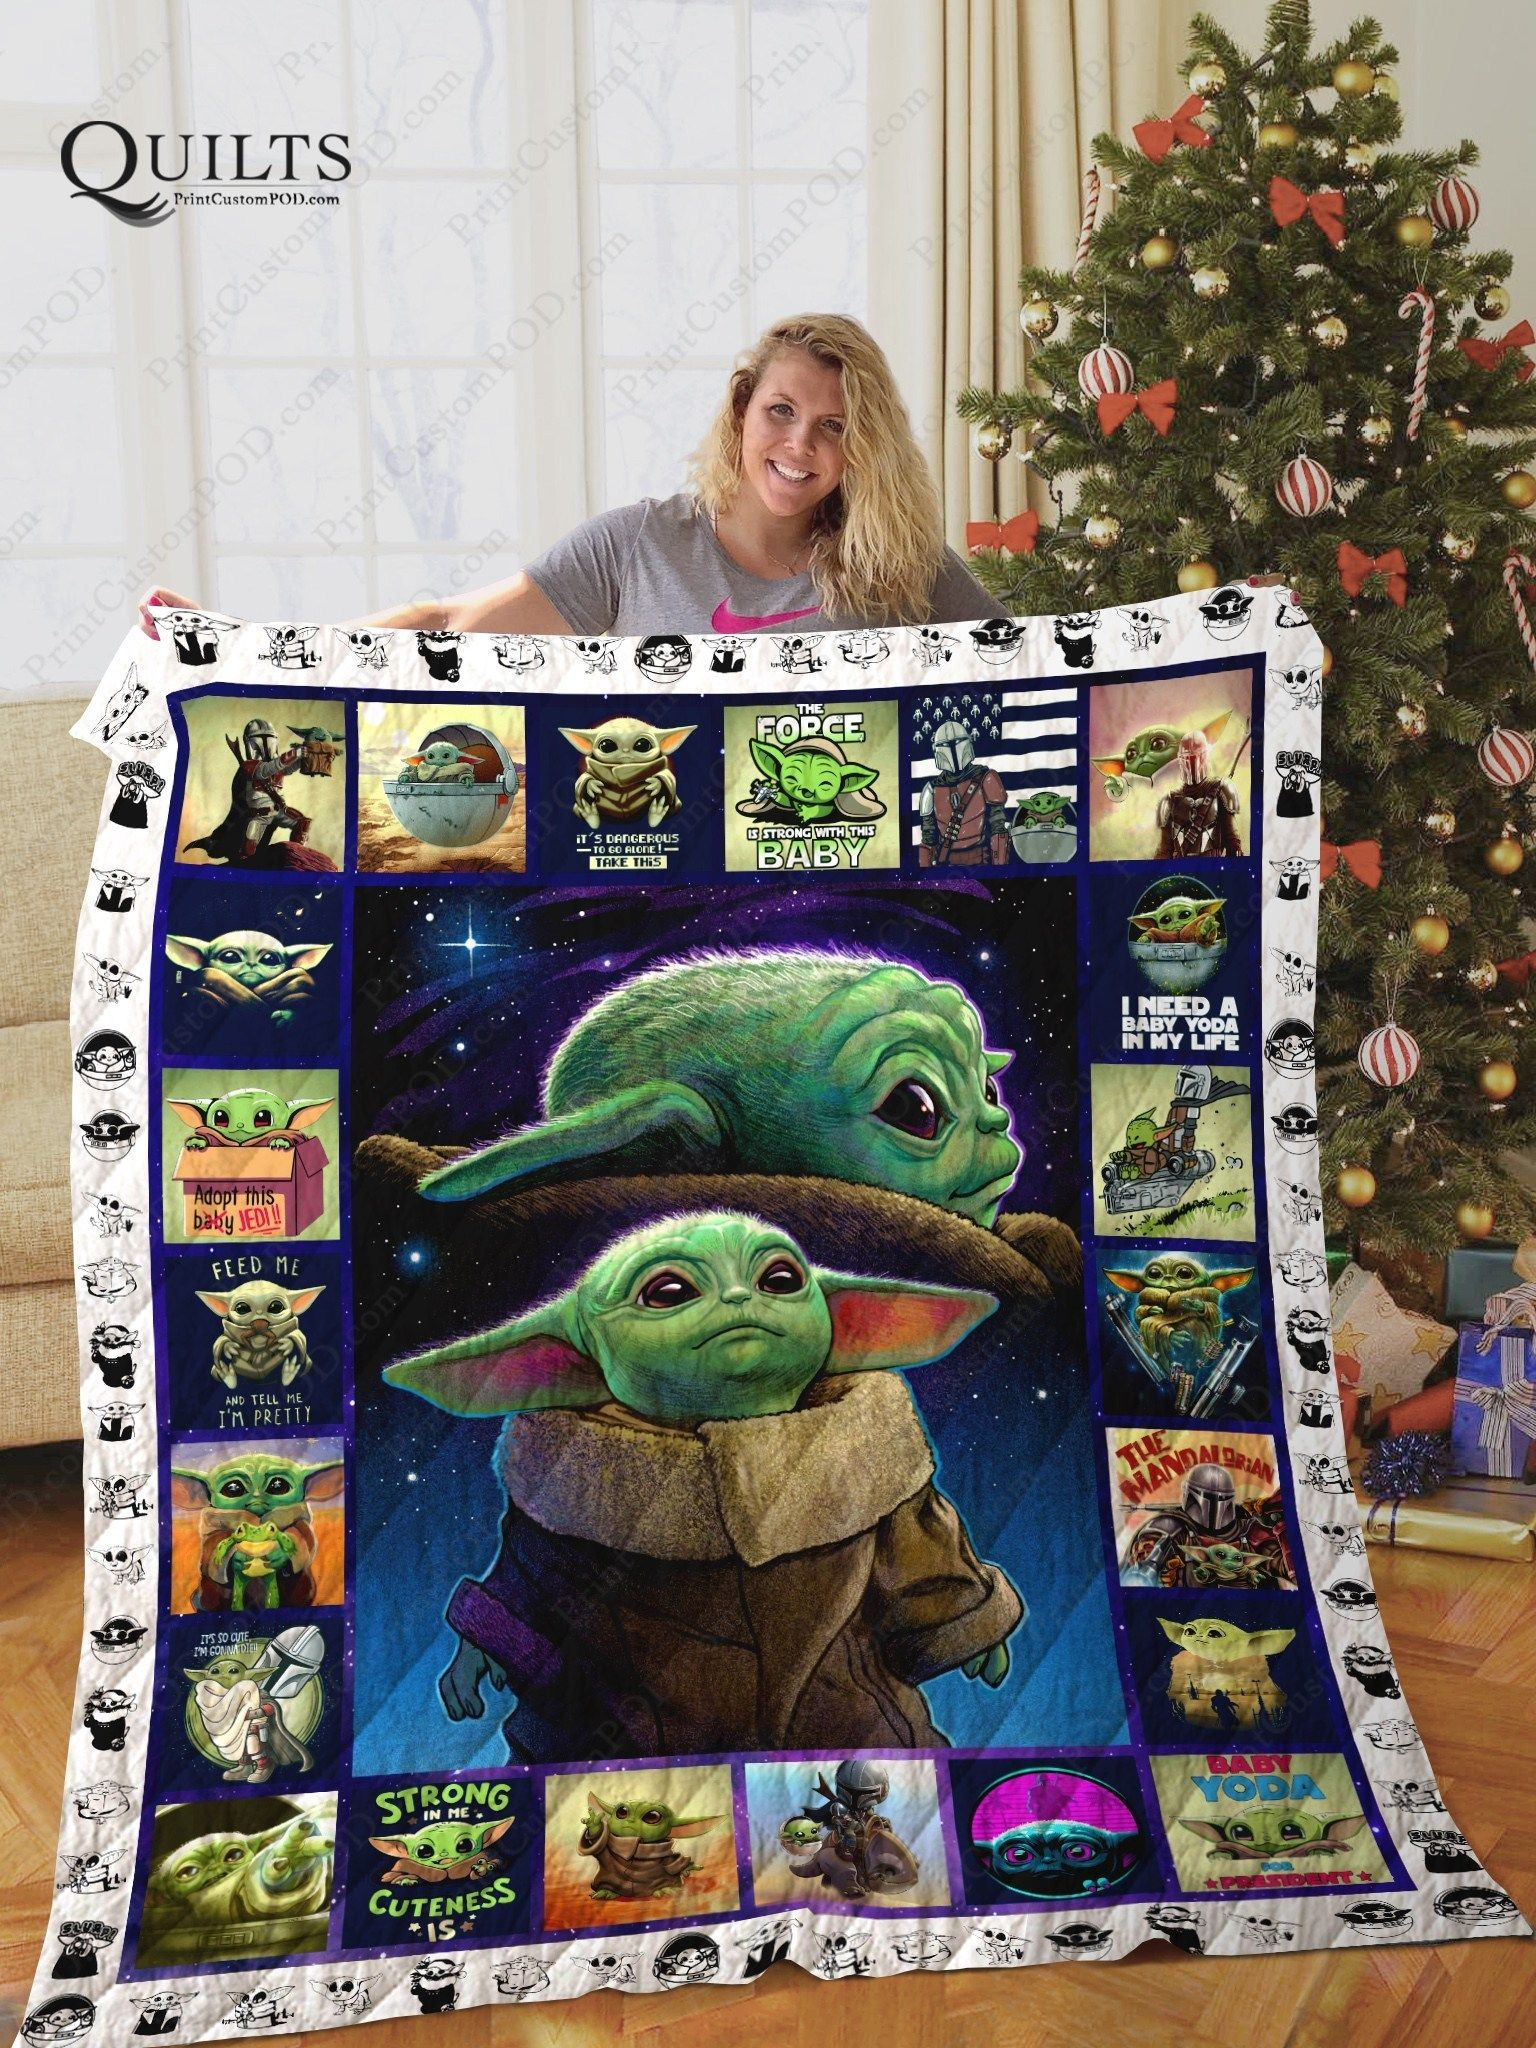 [BLT] Baby Yoda Quilt Blanket Ver 3 PrintQuilts Star